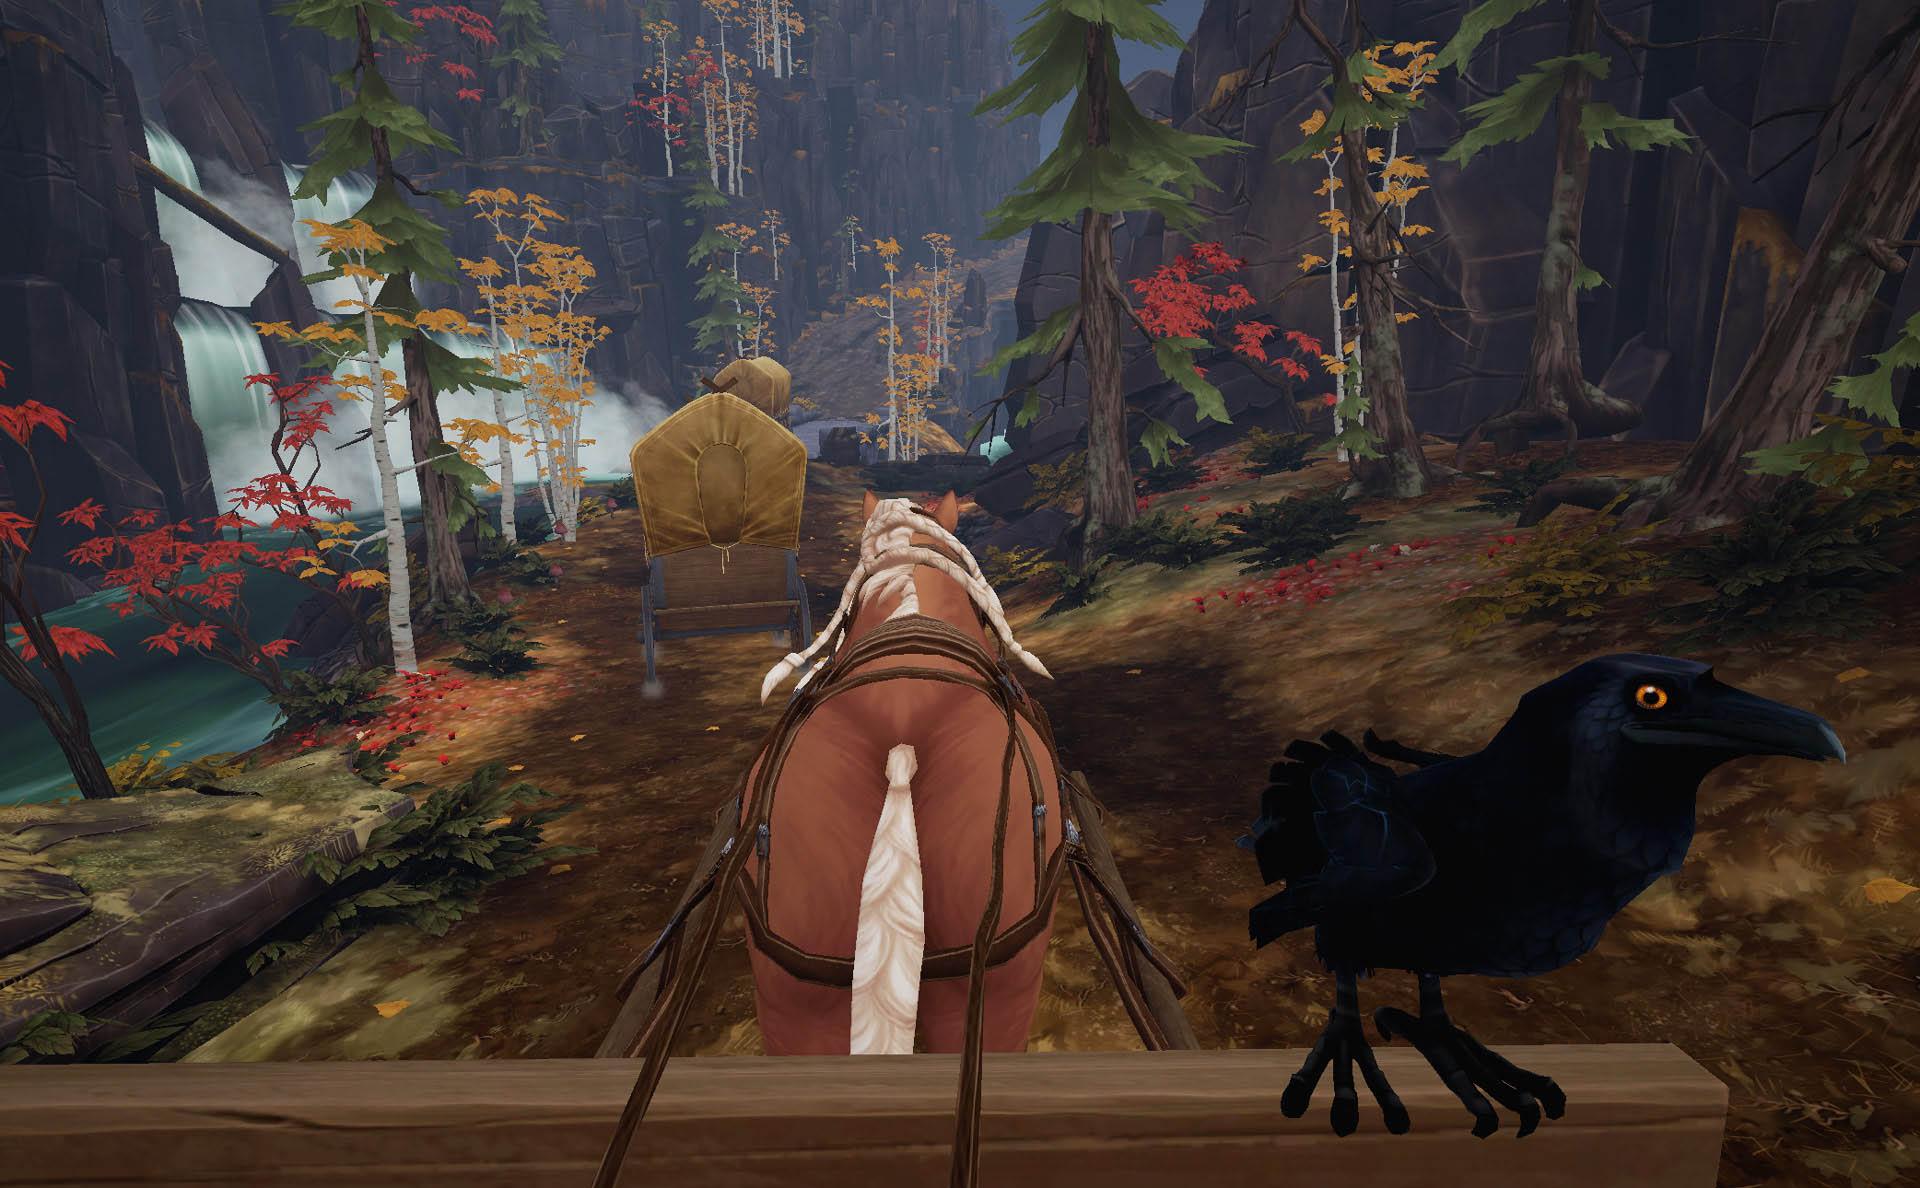 fated-oculus-rift-virtual-reality-screenshot-1